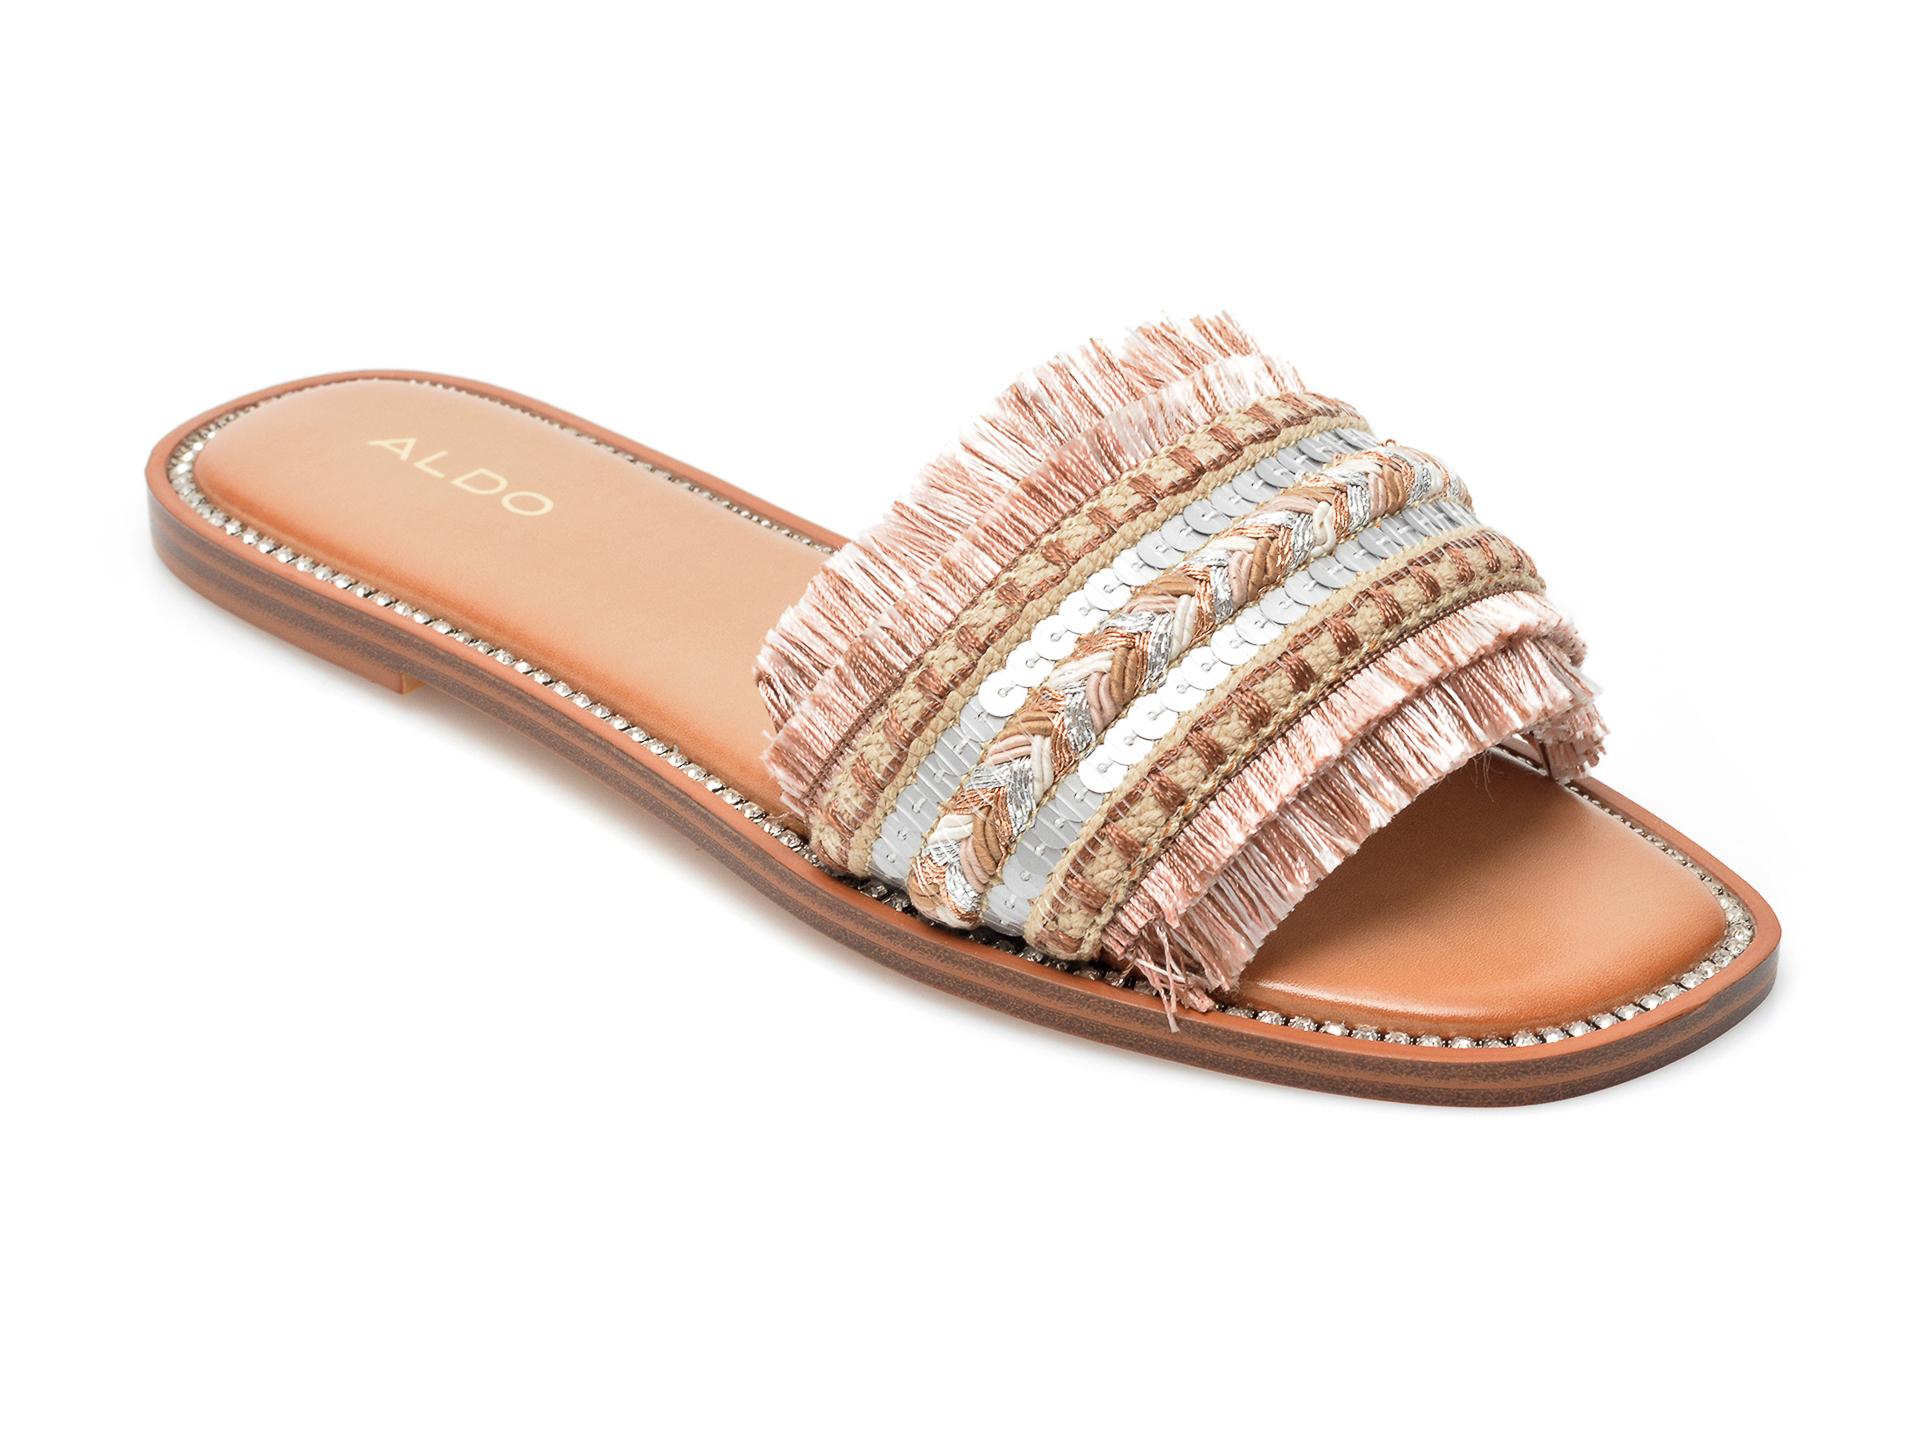 Sandale ALDO roz, Rockyy680, din material textil imagine otter.ro 2021